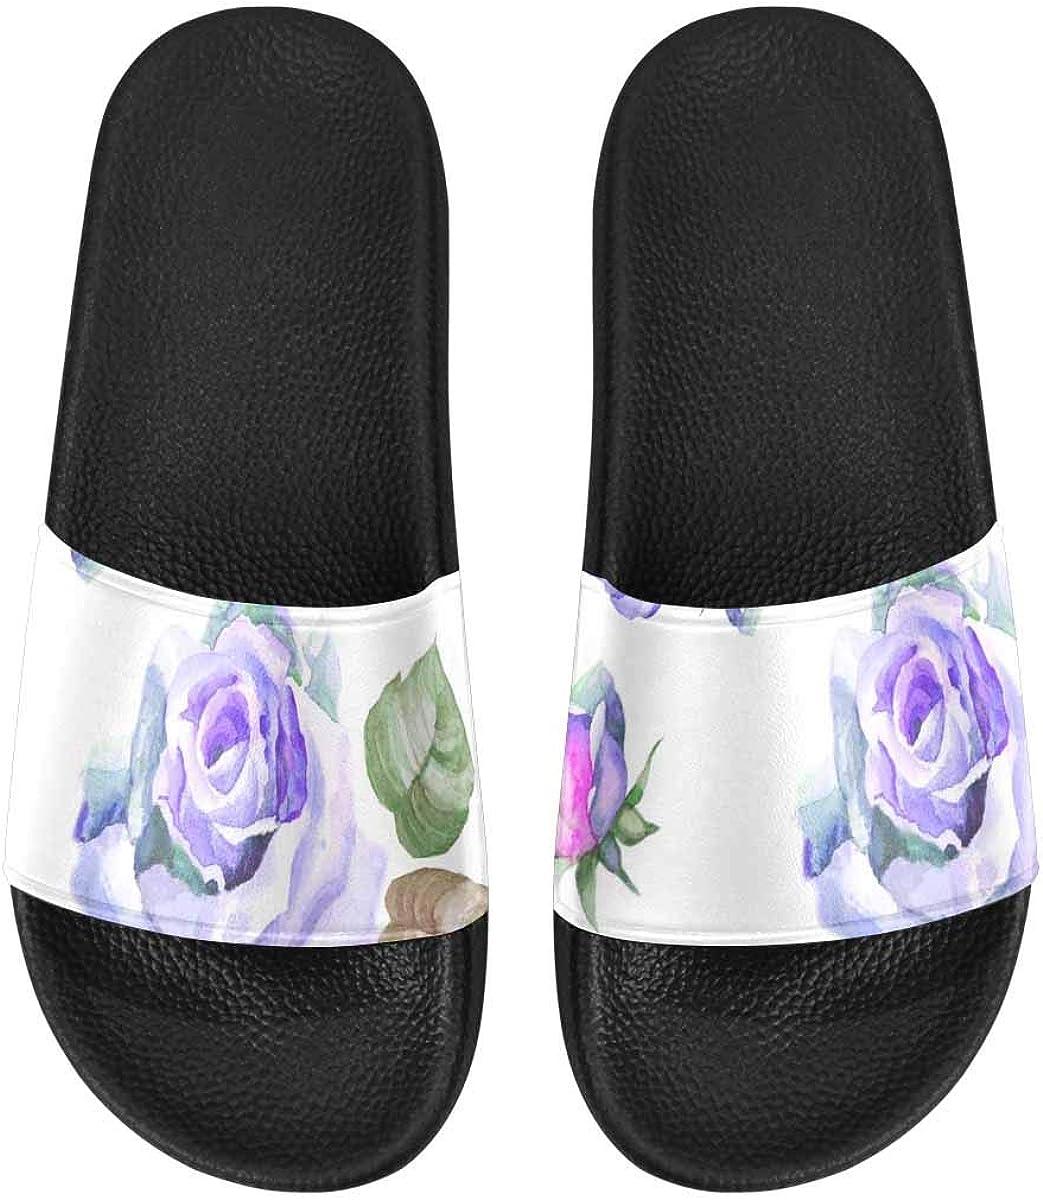 InterestPrint Women's Stylish Slipper Sandals Made from Soft Material Watercolor Funny Koala